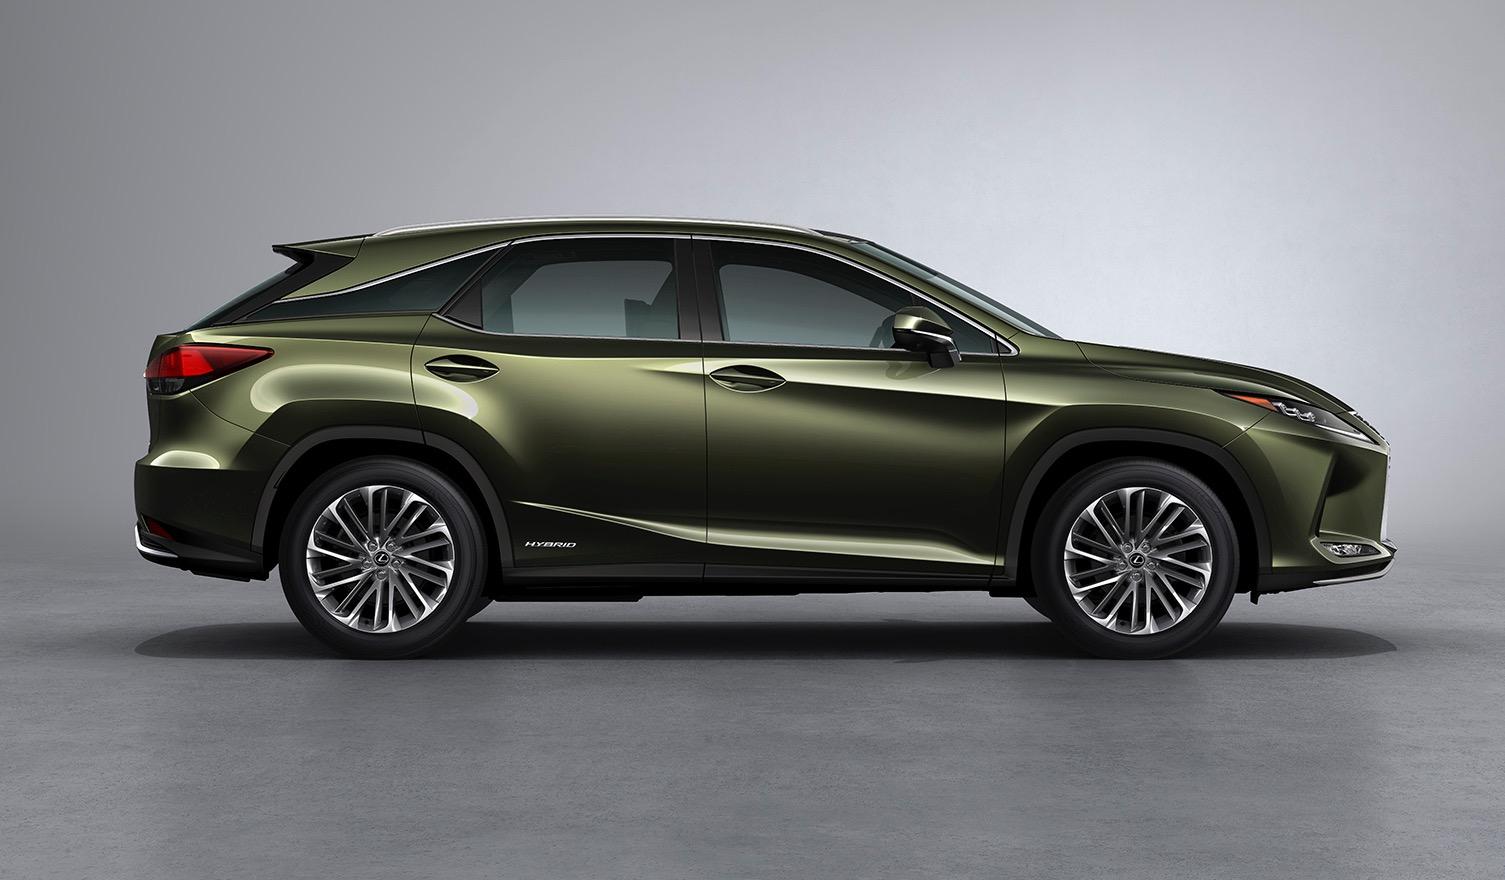 2020 Lexus Rx Range Announced For Australia Performancedrive